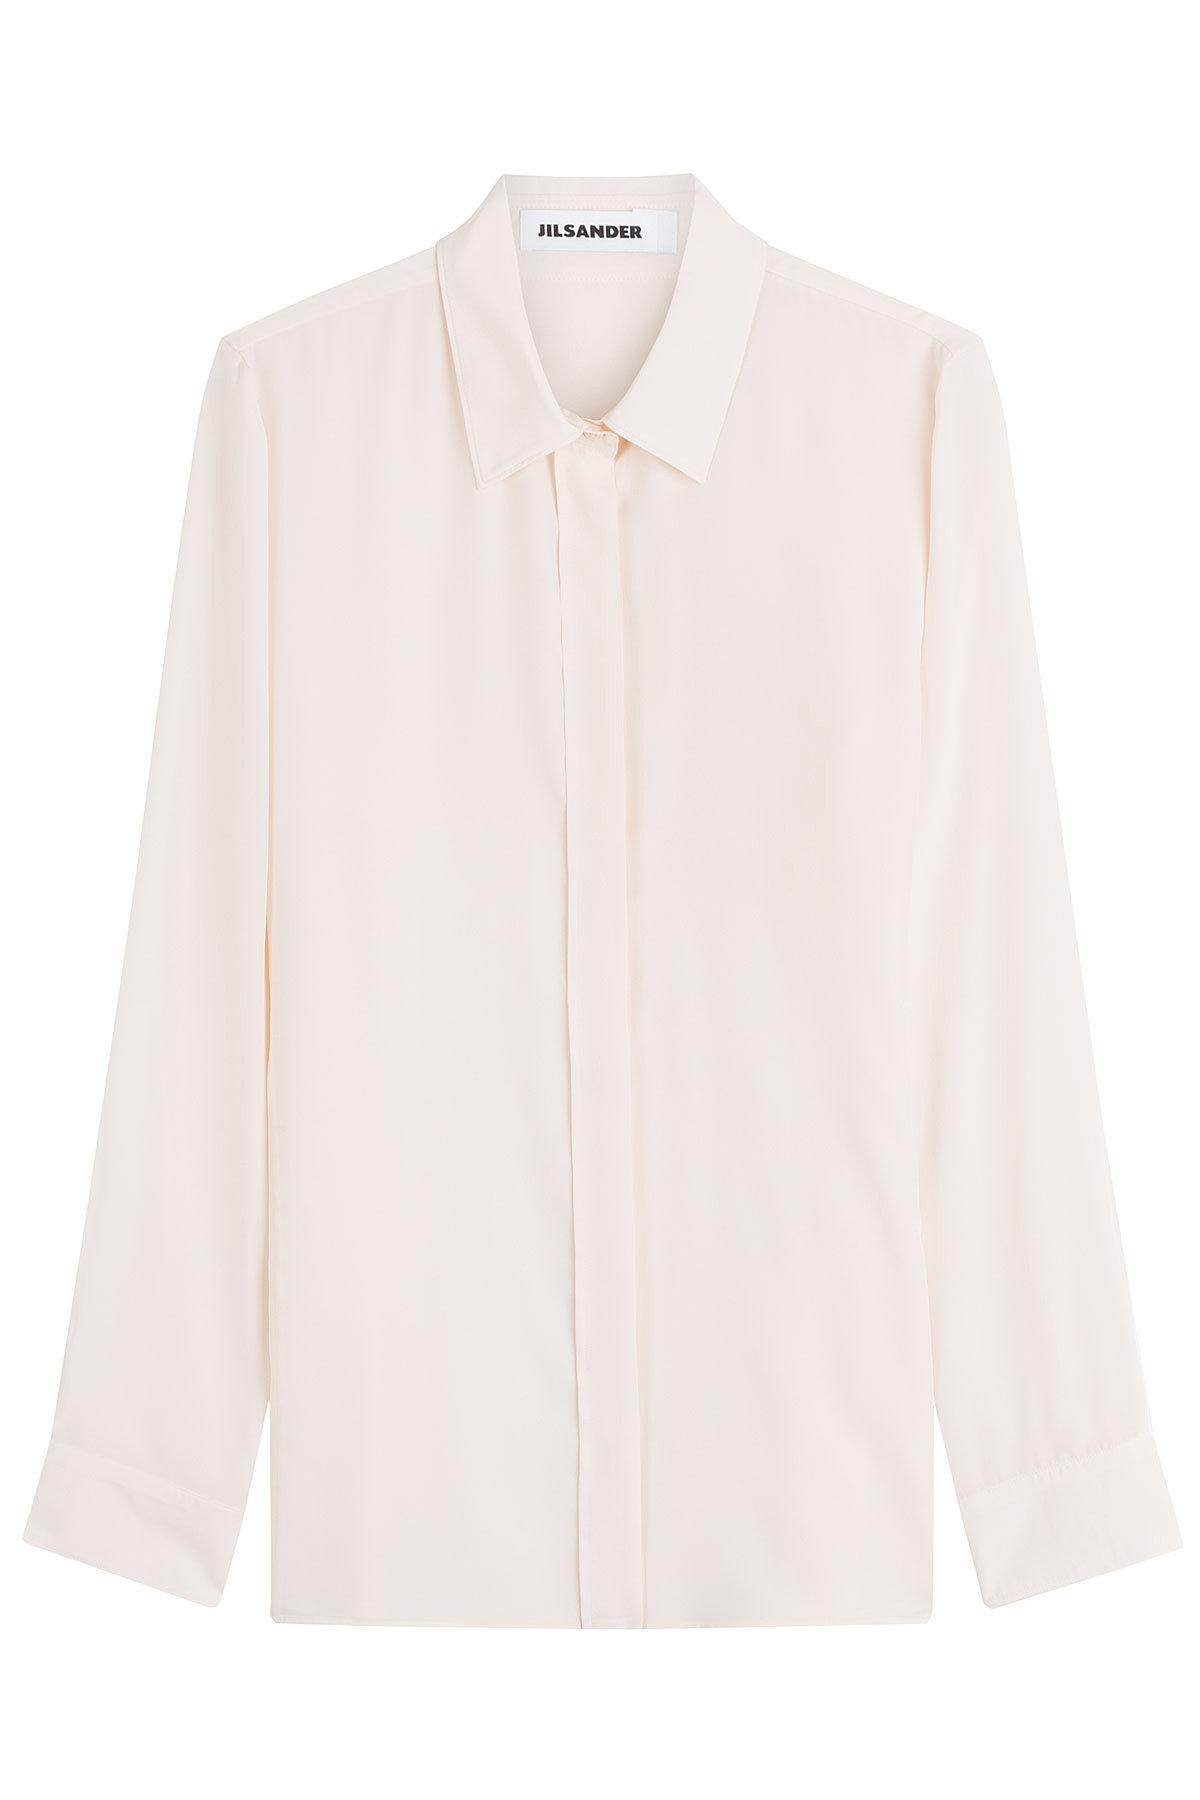 Jil Sander ivory white silk blouse